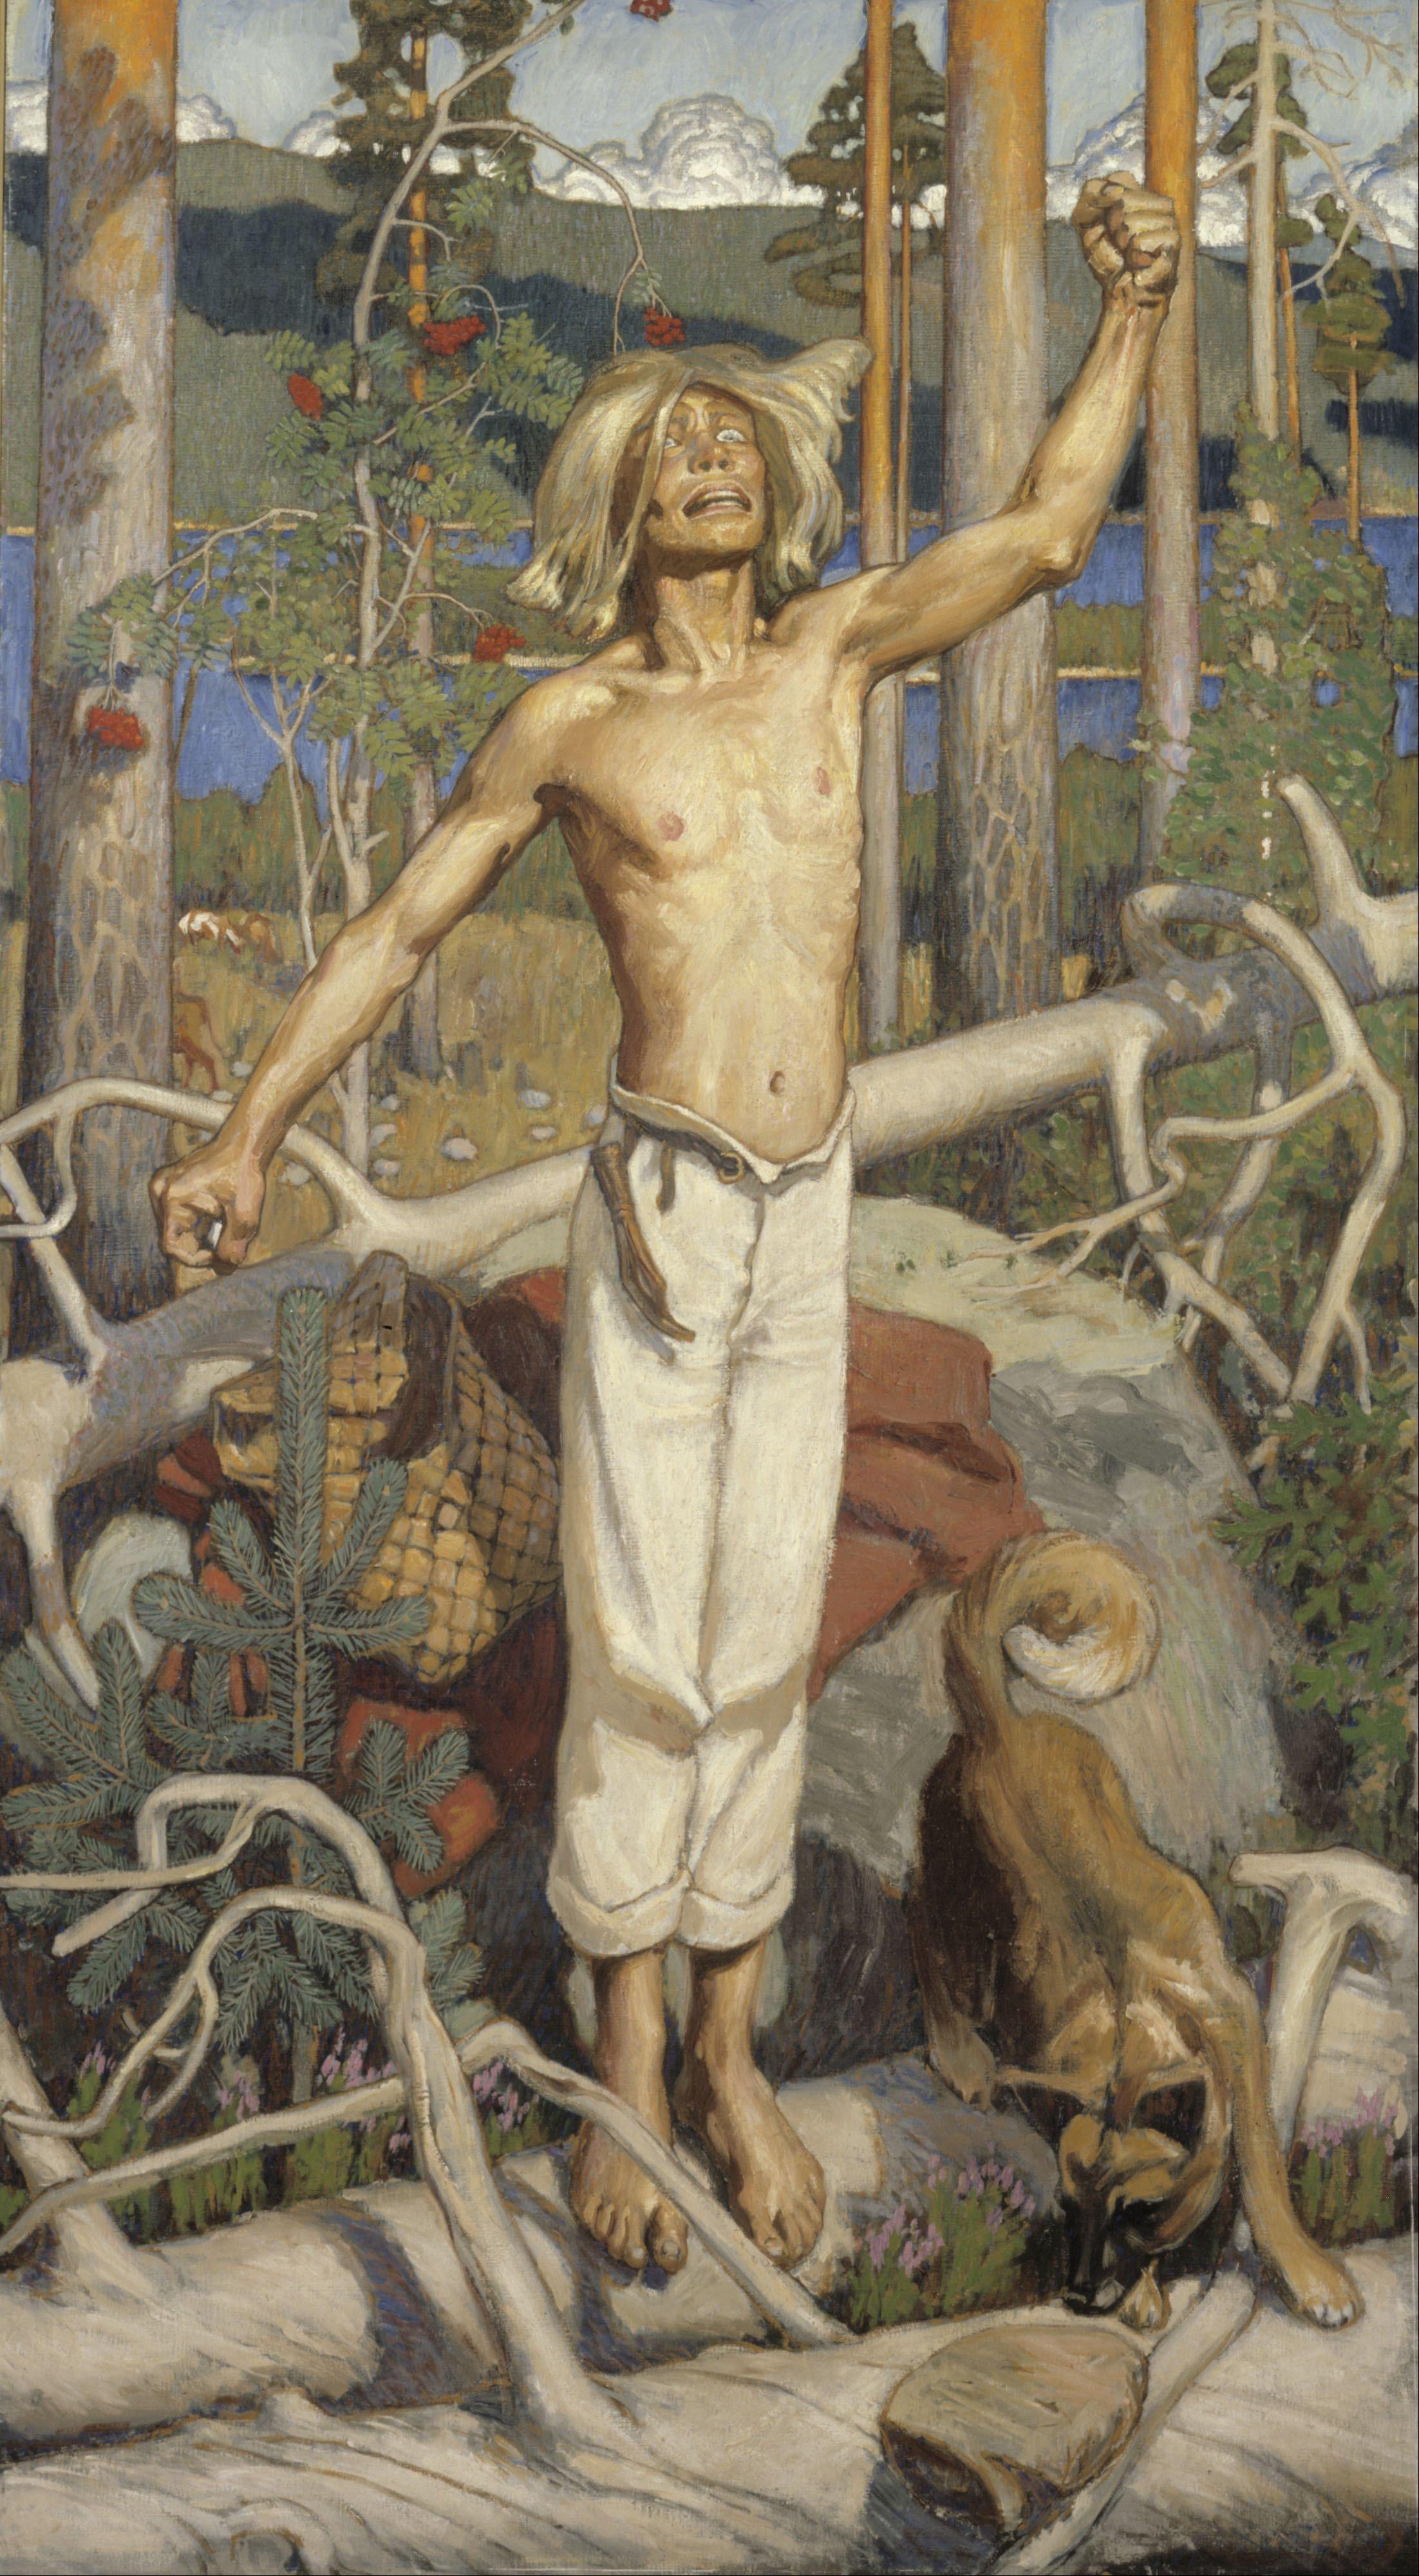 Akseli Gallen-Kallela (1865 – 1931) Akseli_Gallen-Kallela_-_Kullervo_Cursing_-_Google_Art_Project